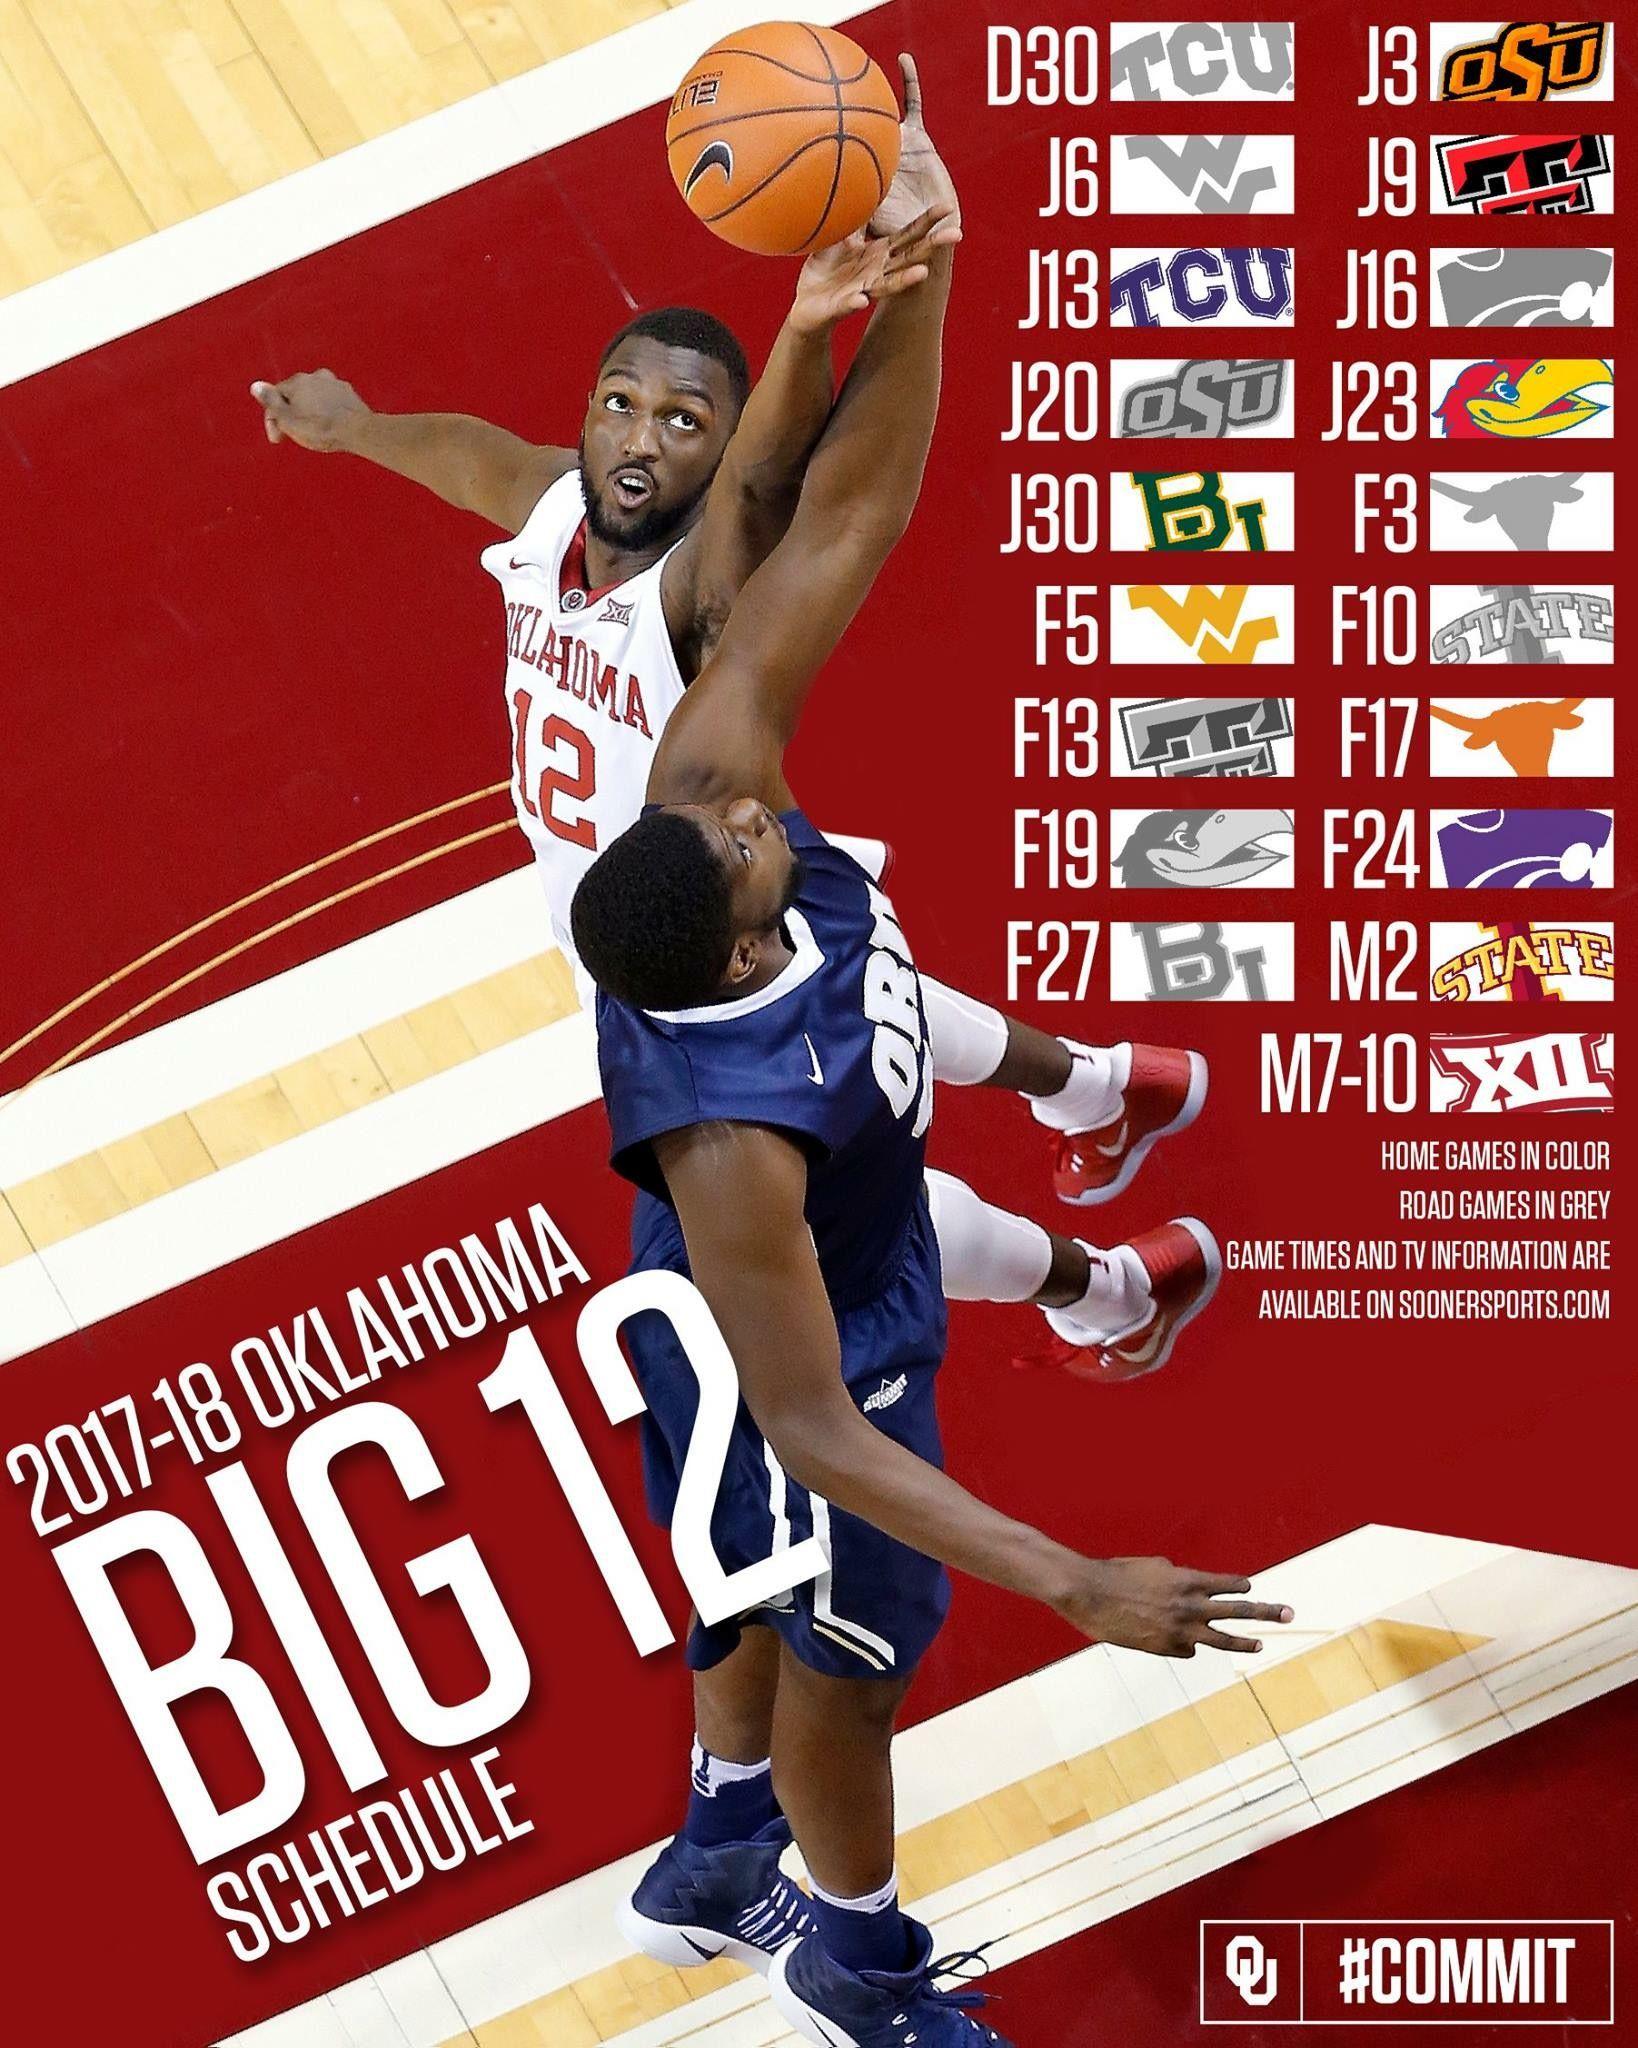 2017-18 Oklahoma Sooners Big XII Basketball Schedule. | Basketball ...